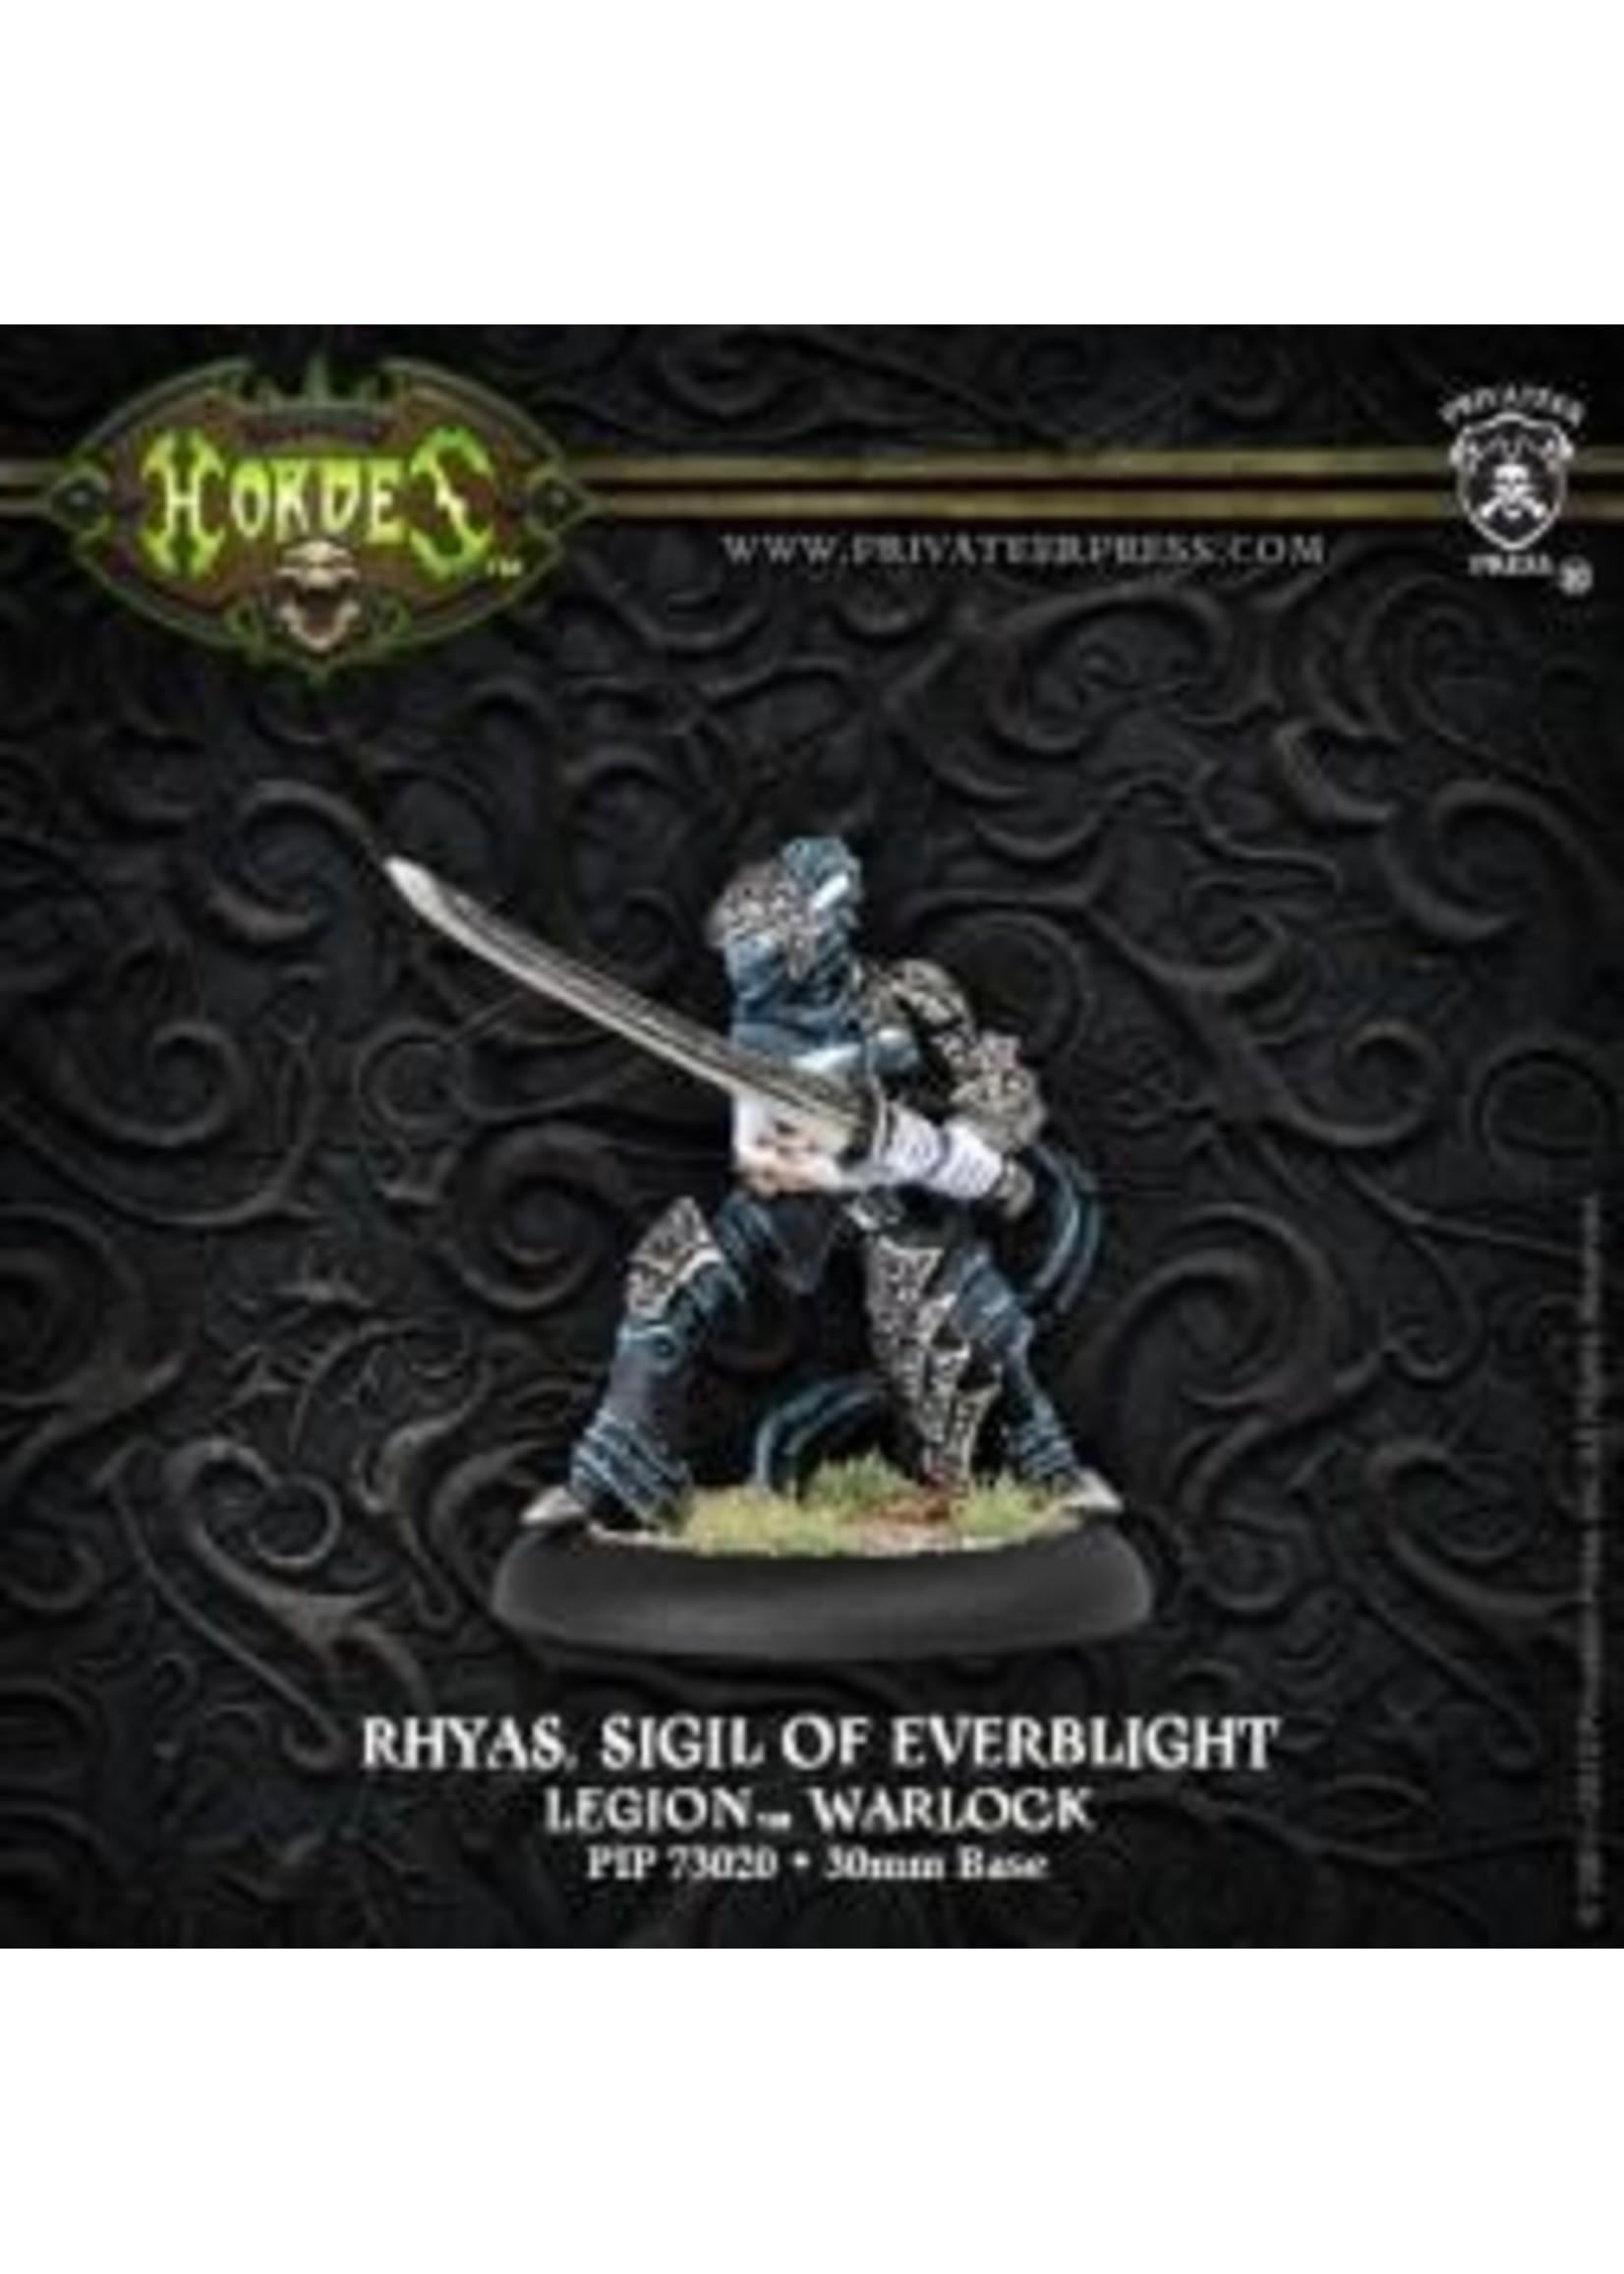 Hordes: Legion of Everblight Rhyas, Sigil of Everblight Blighted Nyss Warlock (White Metal)